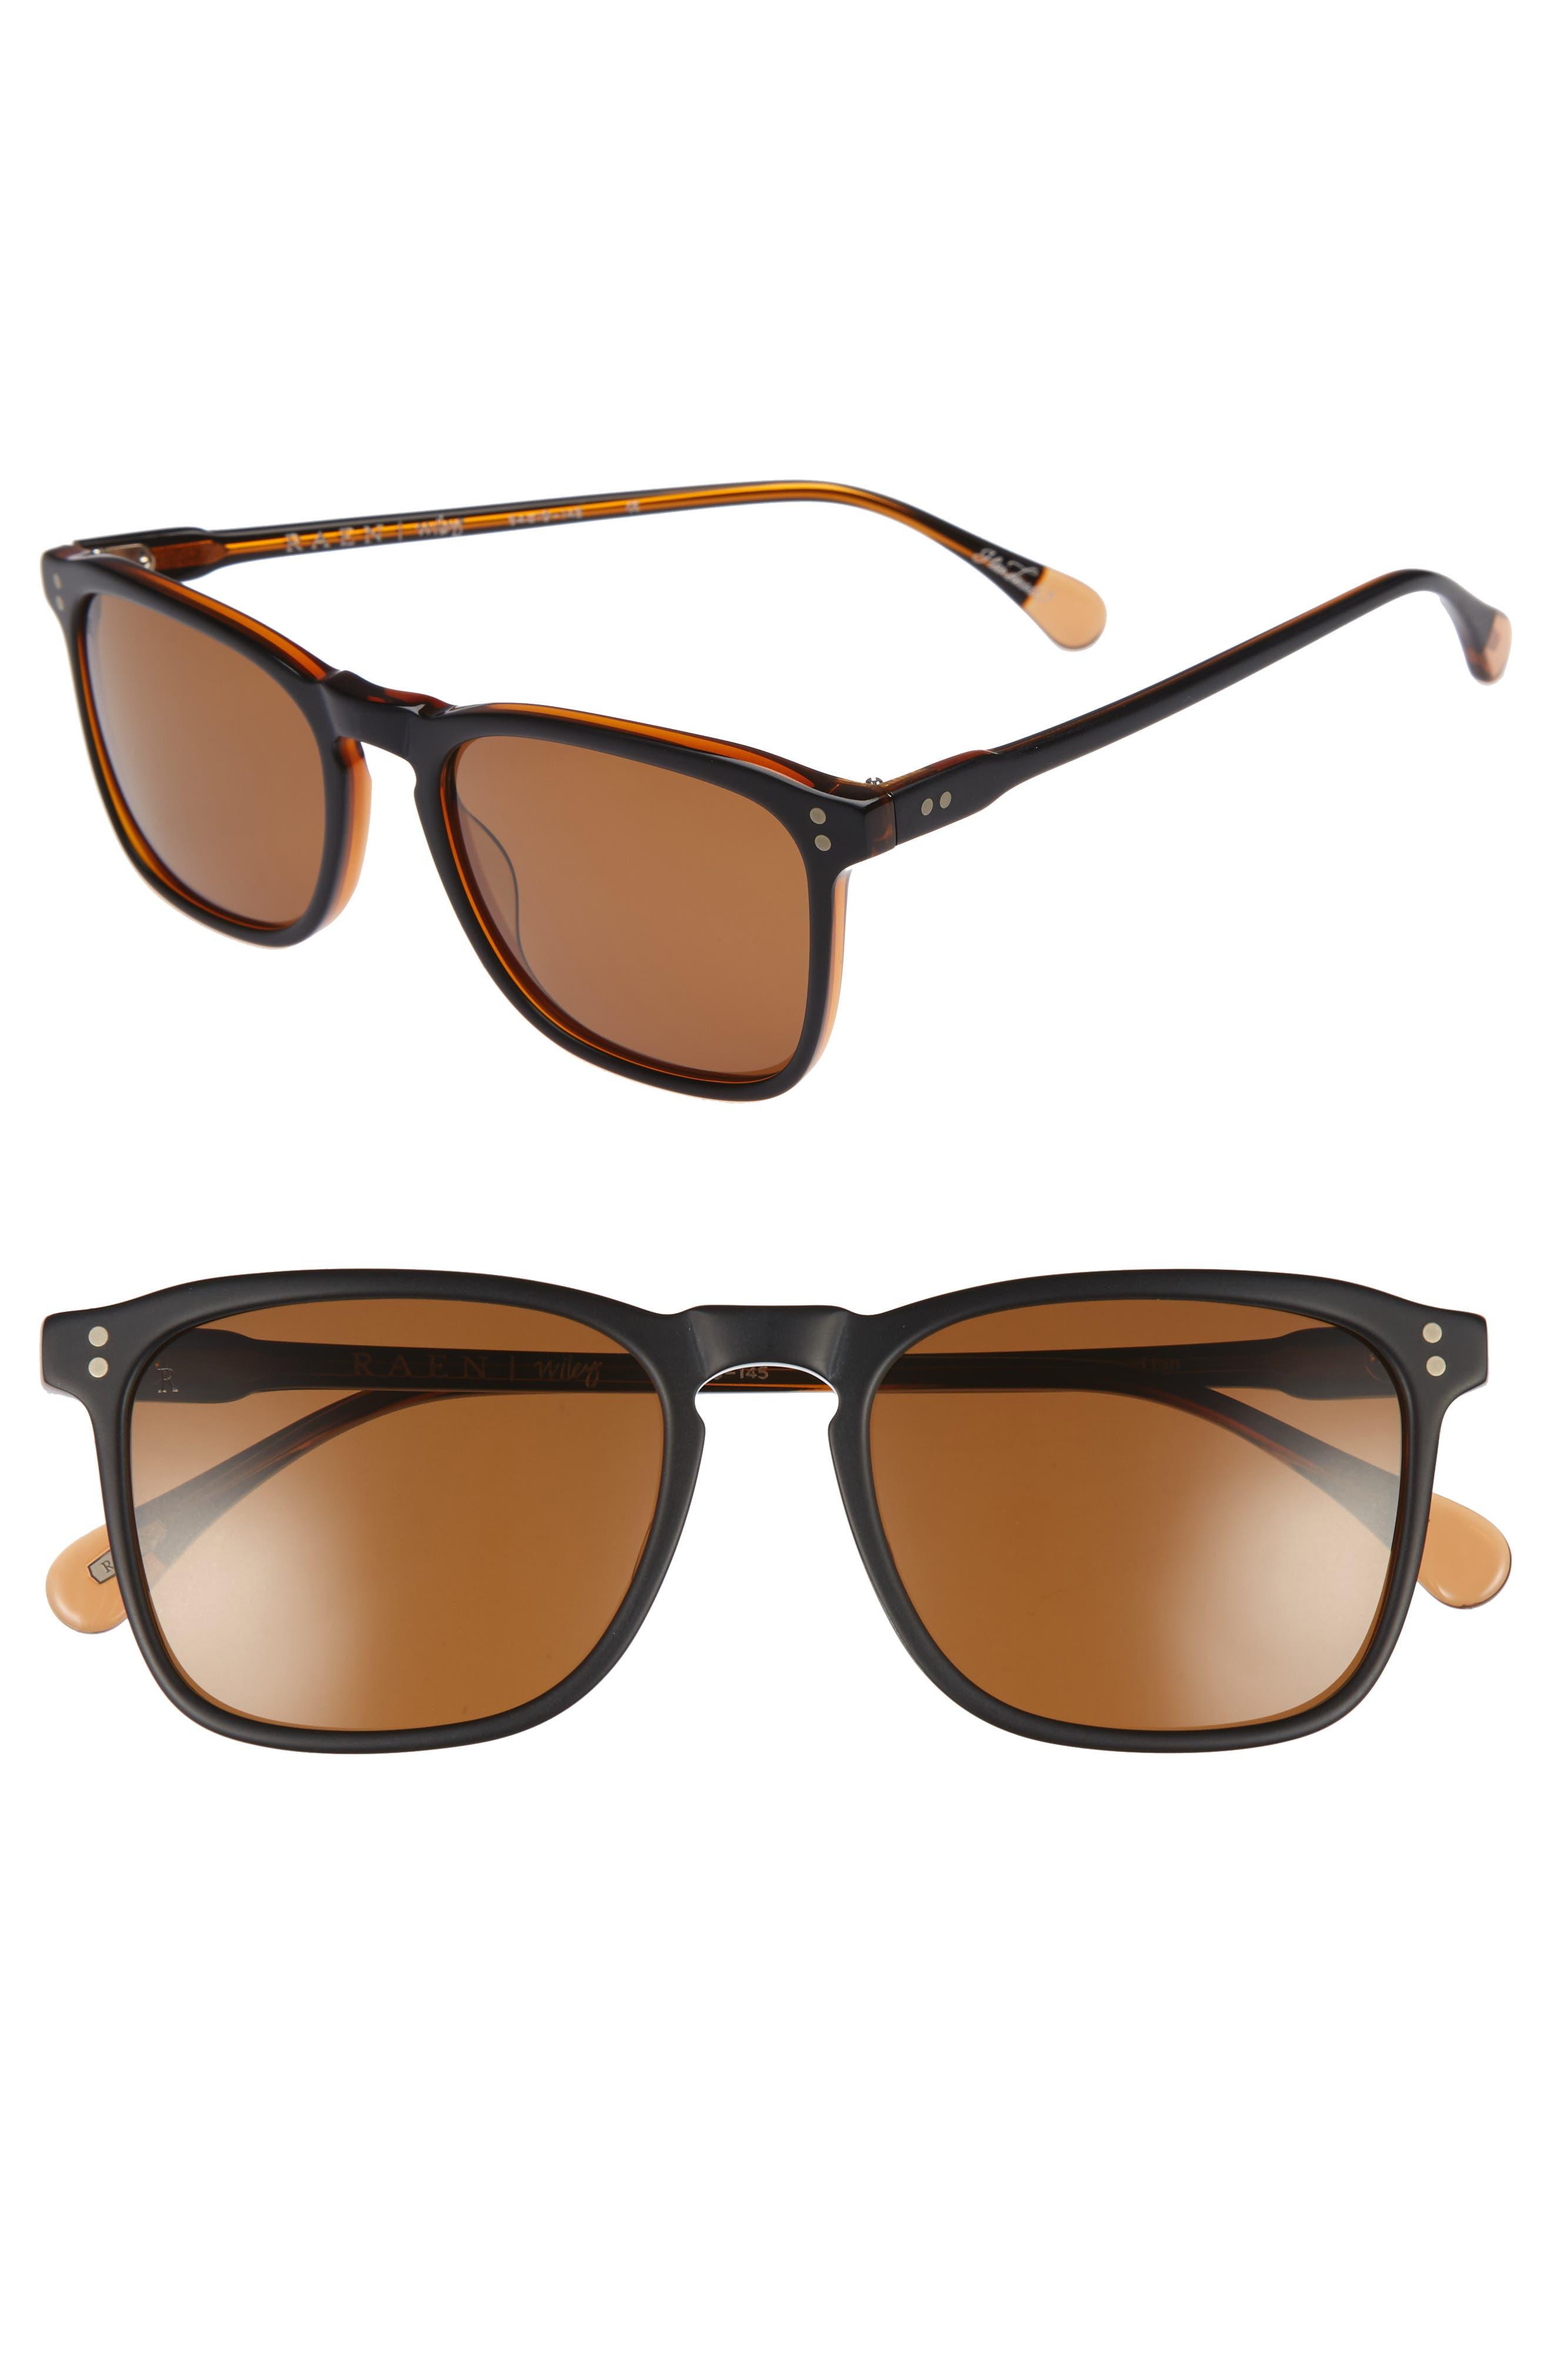 Alternate Image 1 Selected - Raen Wiley 54mm Polarized Sunglasses